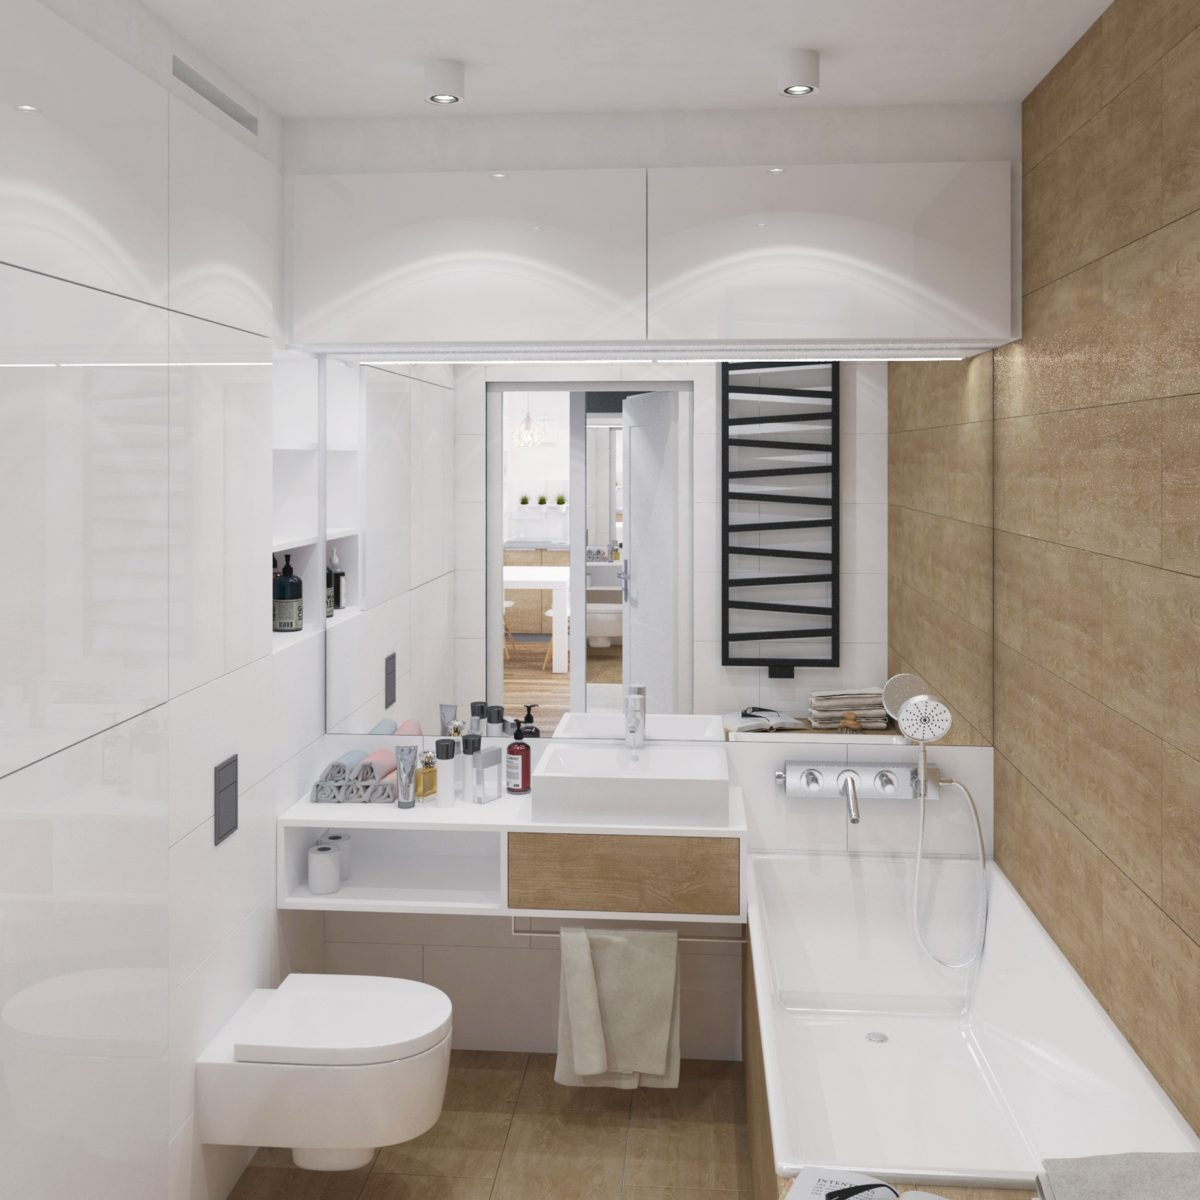 projekt łazienki architekt katowice